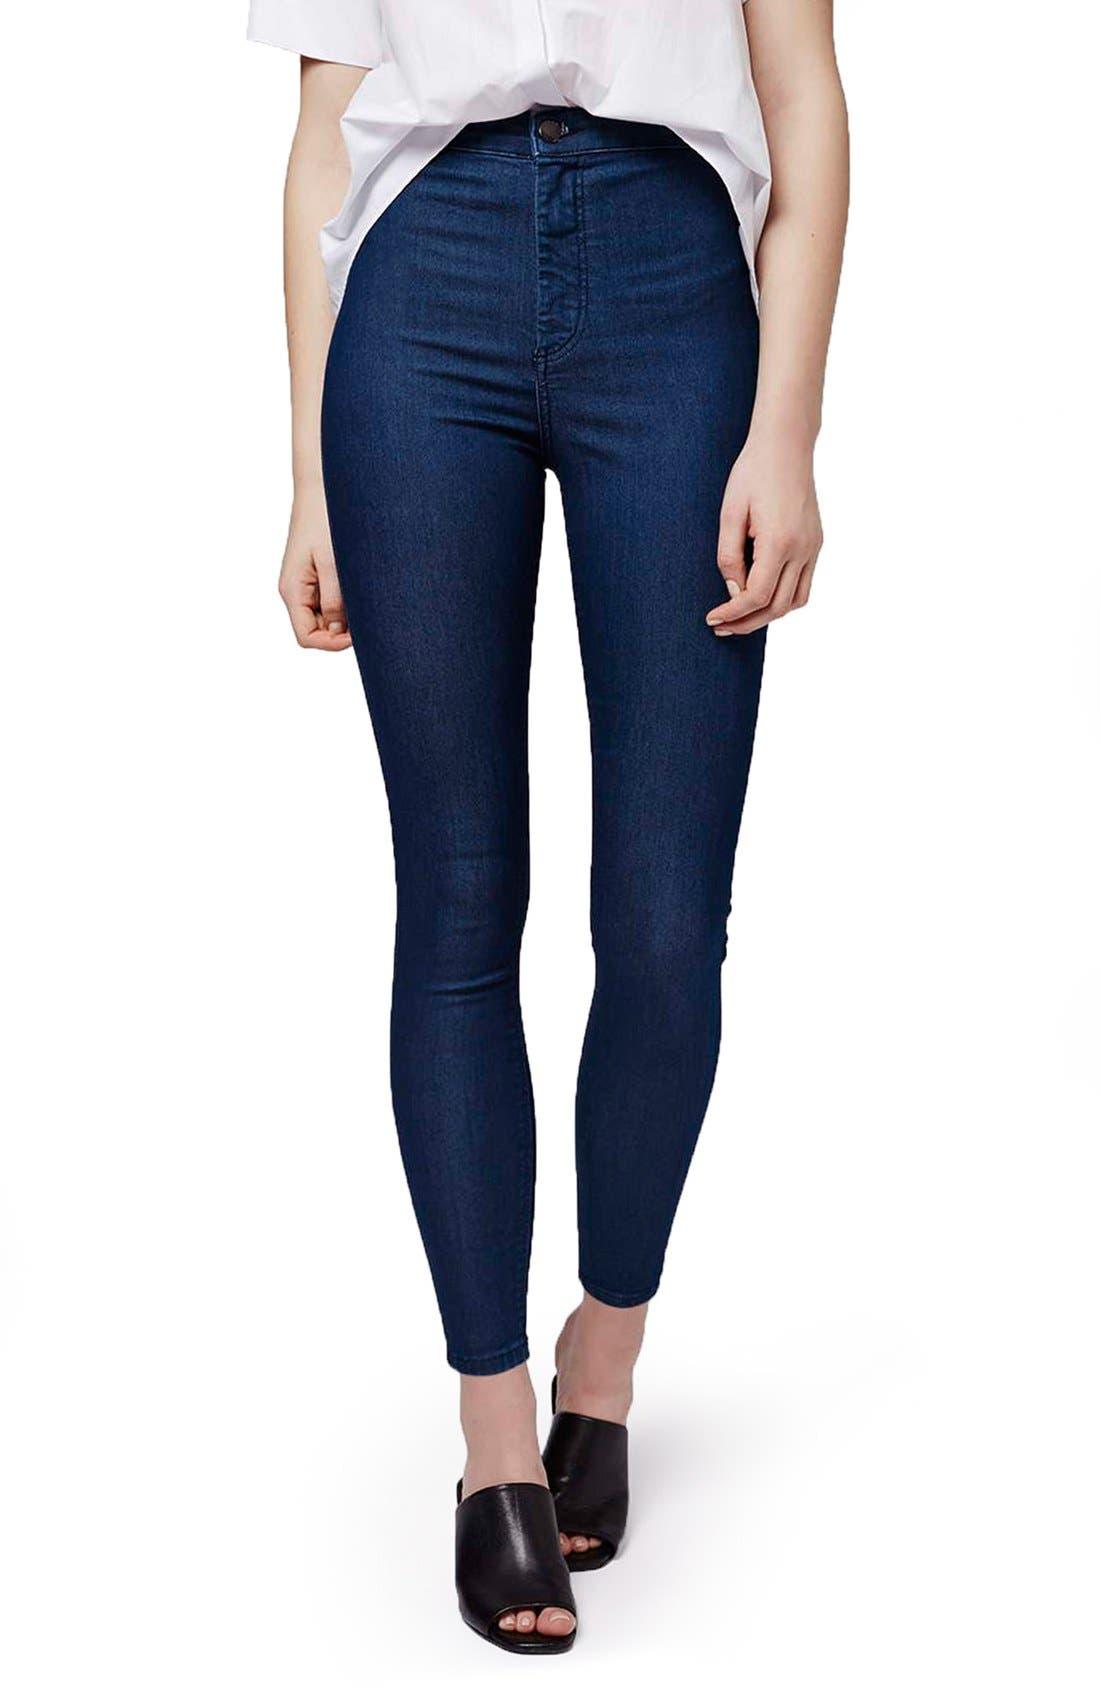 Alternate Image 1 Selected - Topshop 'Joni' Super Skinny Jeans (Petite)